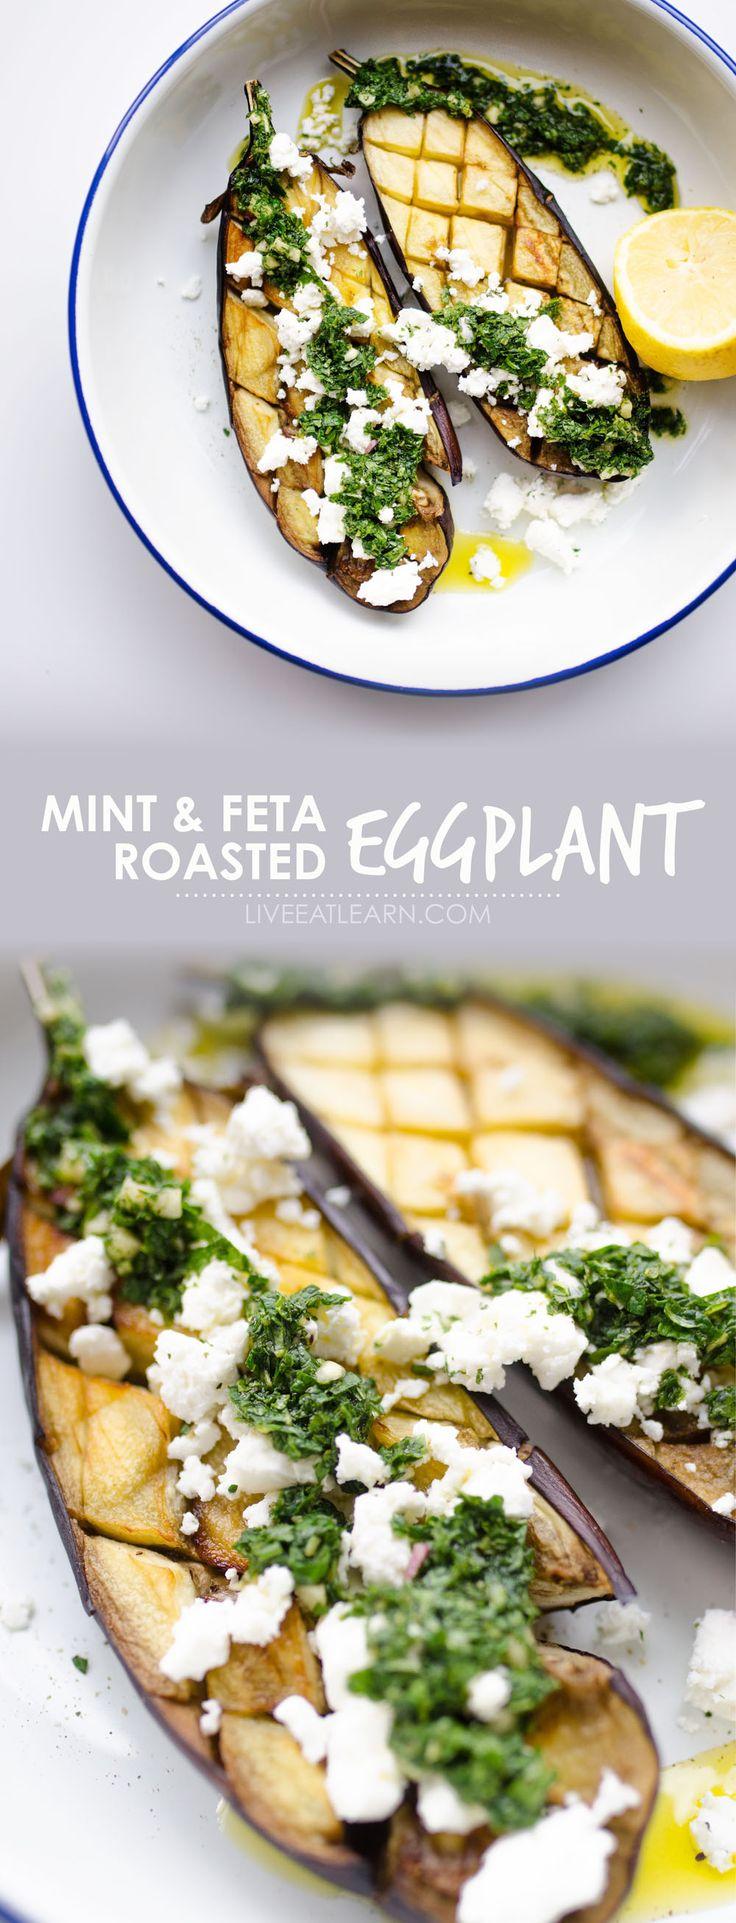 roasted eggplant with mint sauce and feta  recipe  roast